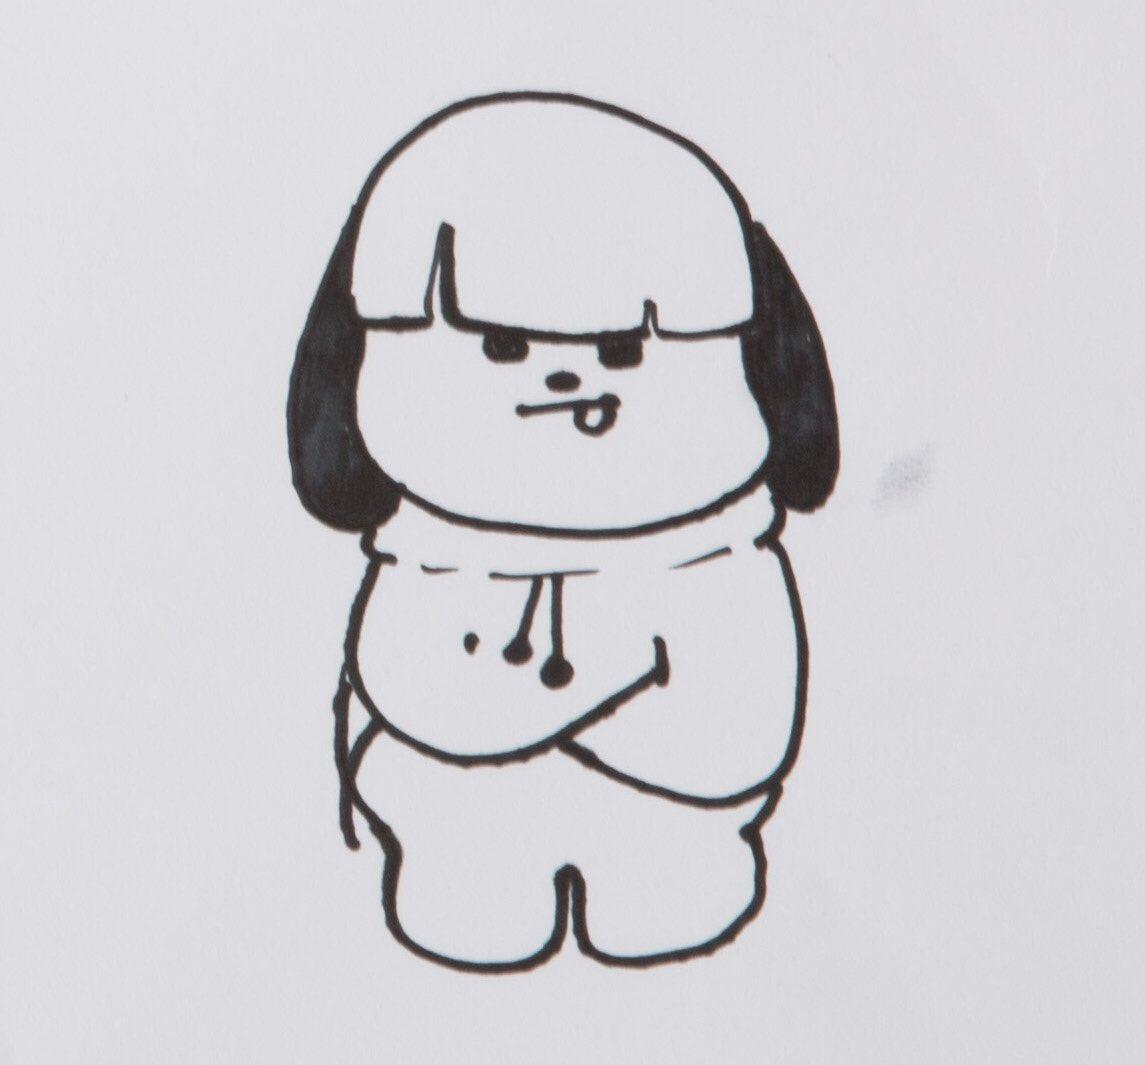 Bt21 On Twitter Quot 누가 그린 그림일까요7 Whose Drawing Chimmy 치미